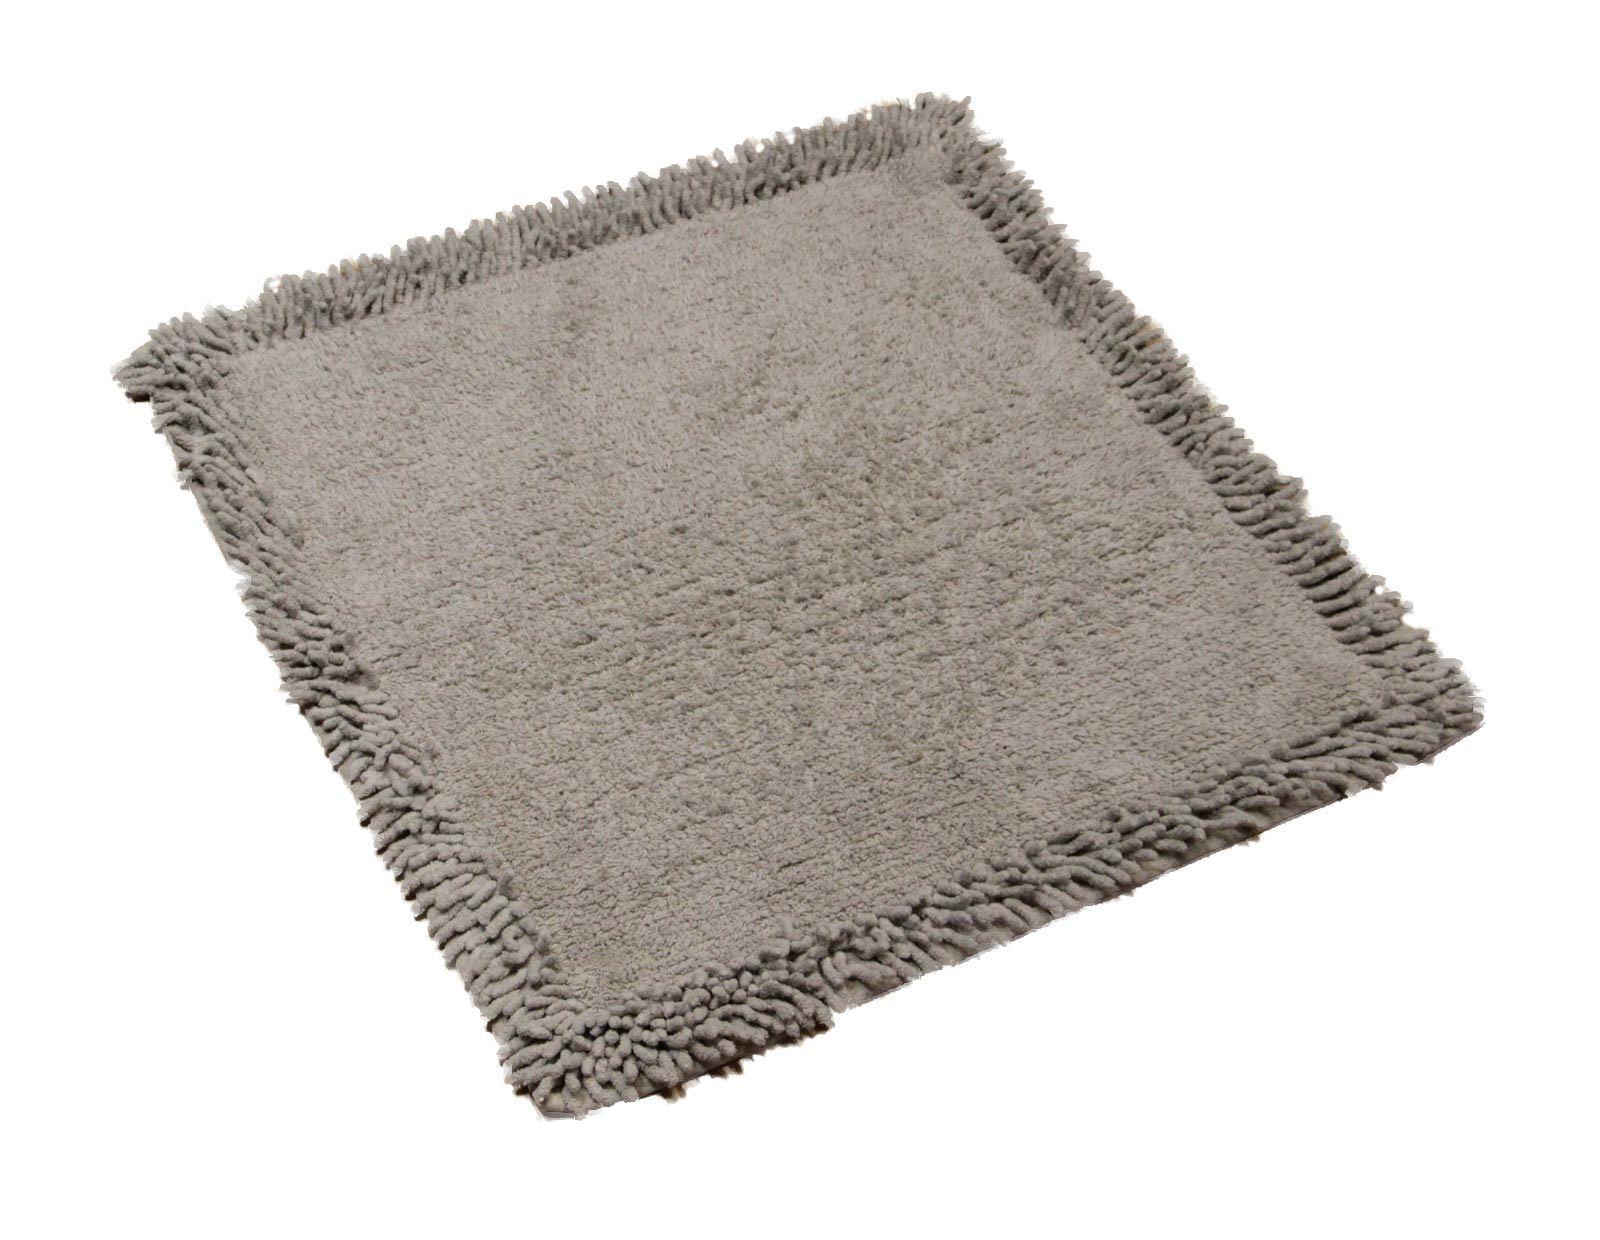 Soft Square Bathroom Bath Shower Mats Rug 100 Cotton